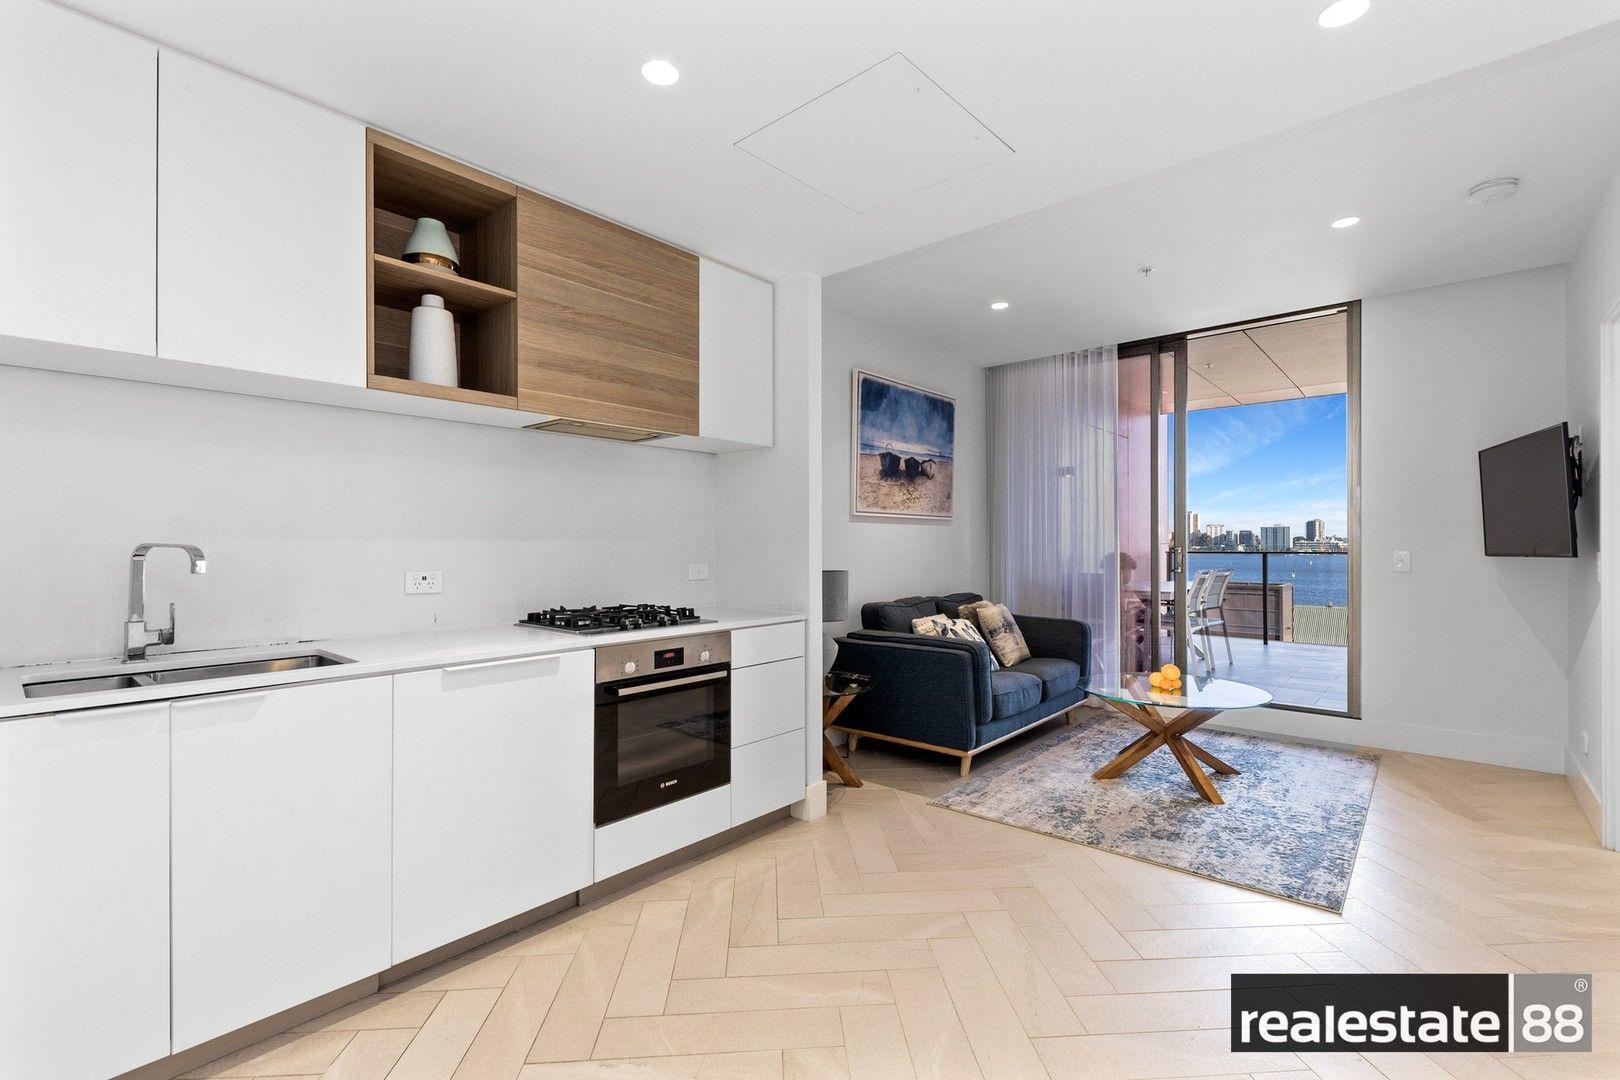 1 bedrooms Apartment / Unit / Flat in 405/11 Barrack Square PERTH WA, 6000